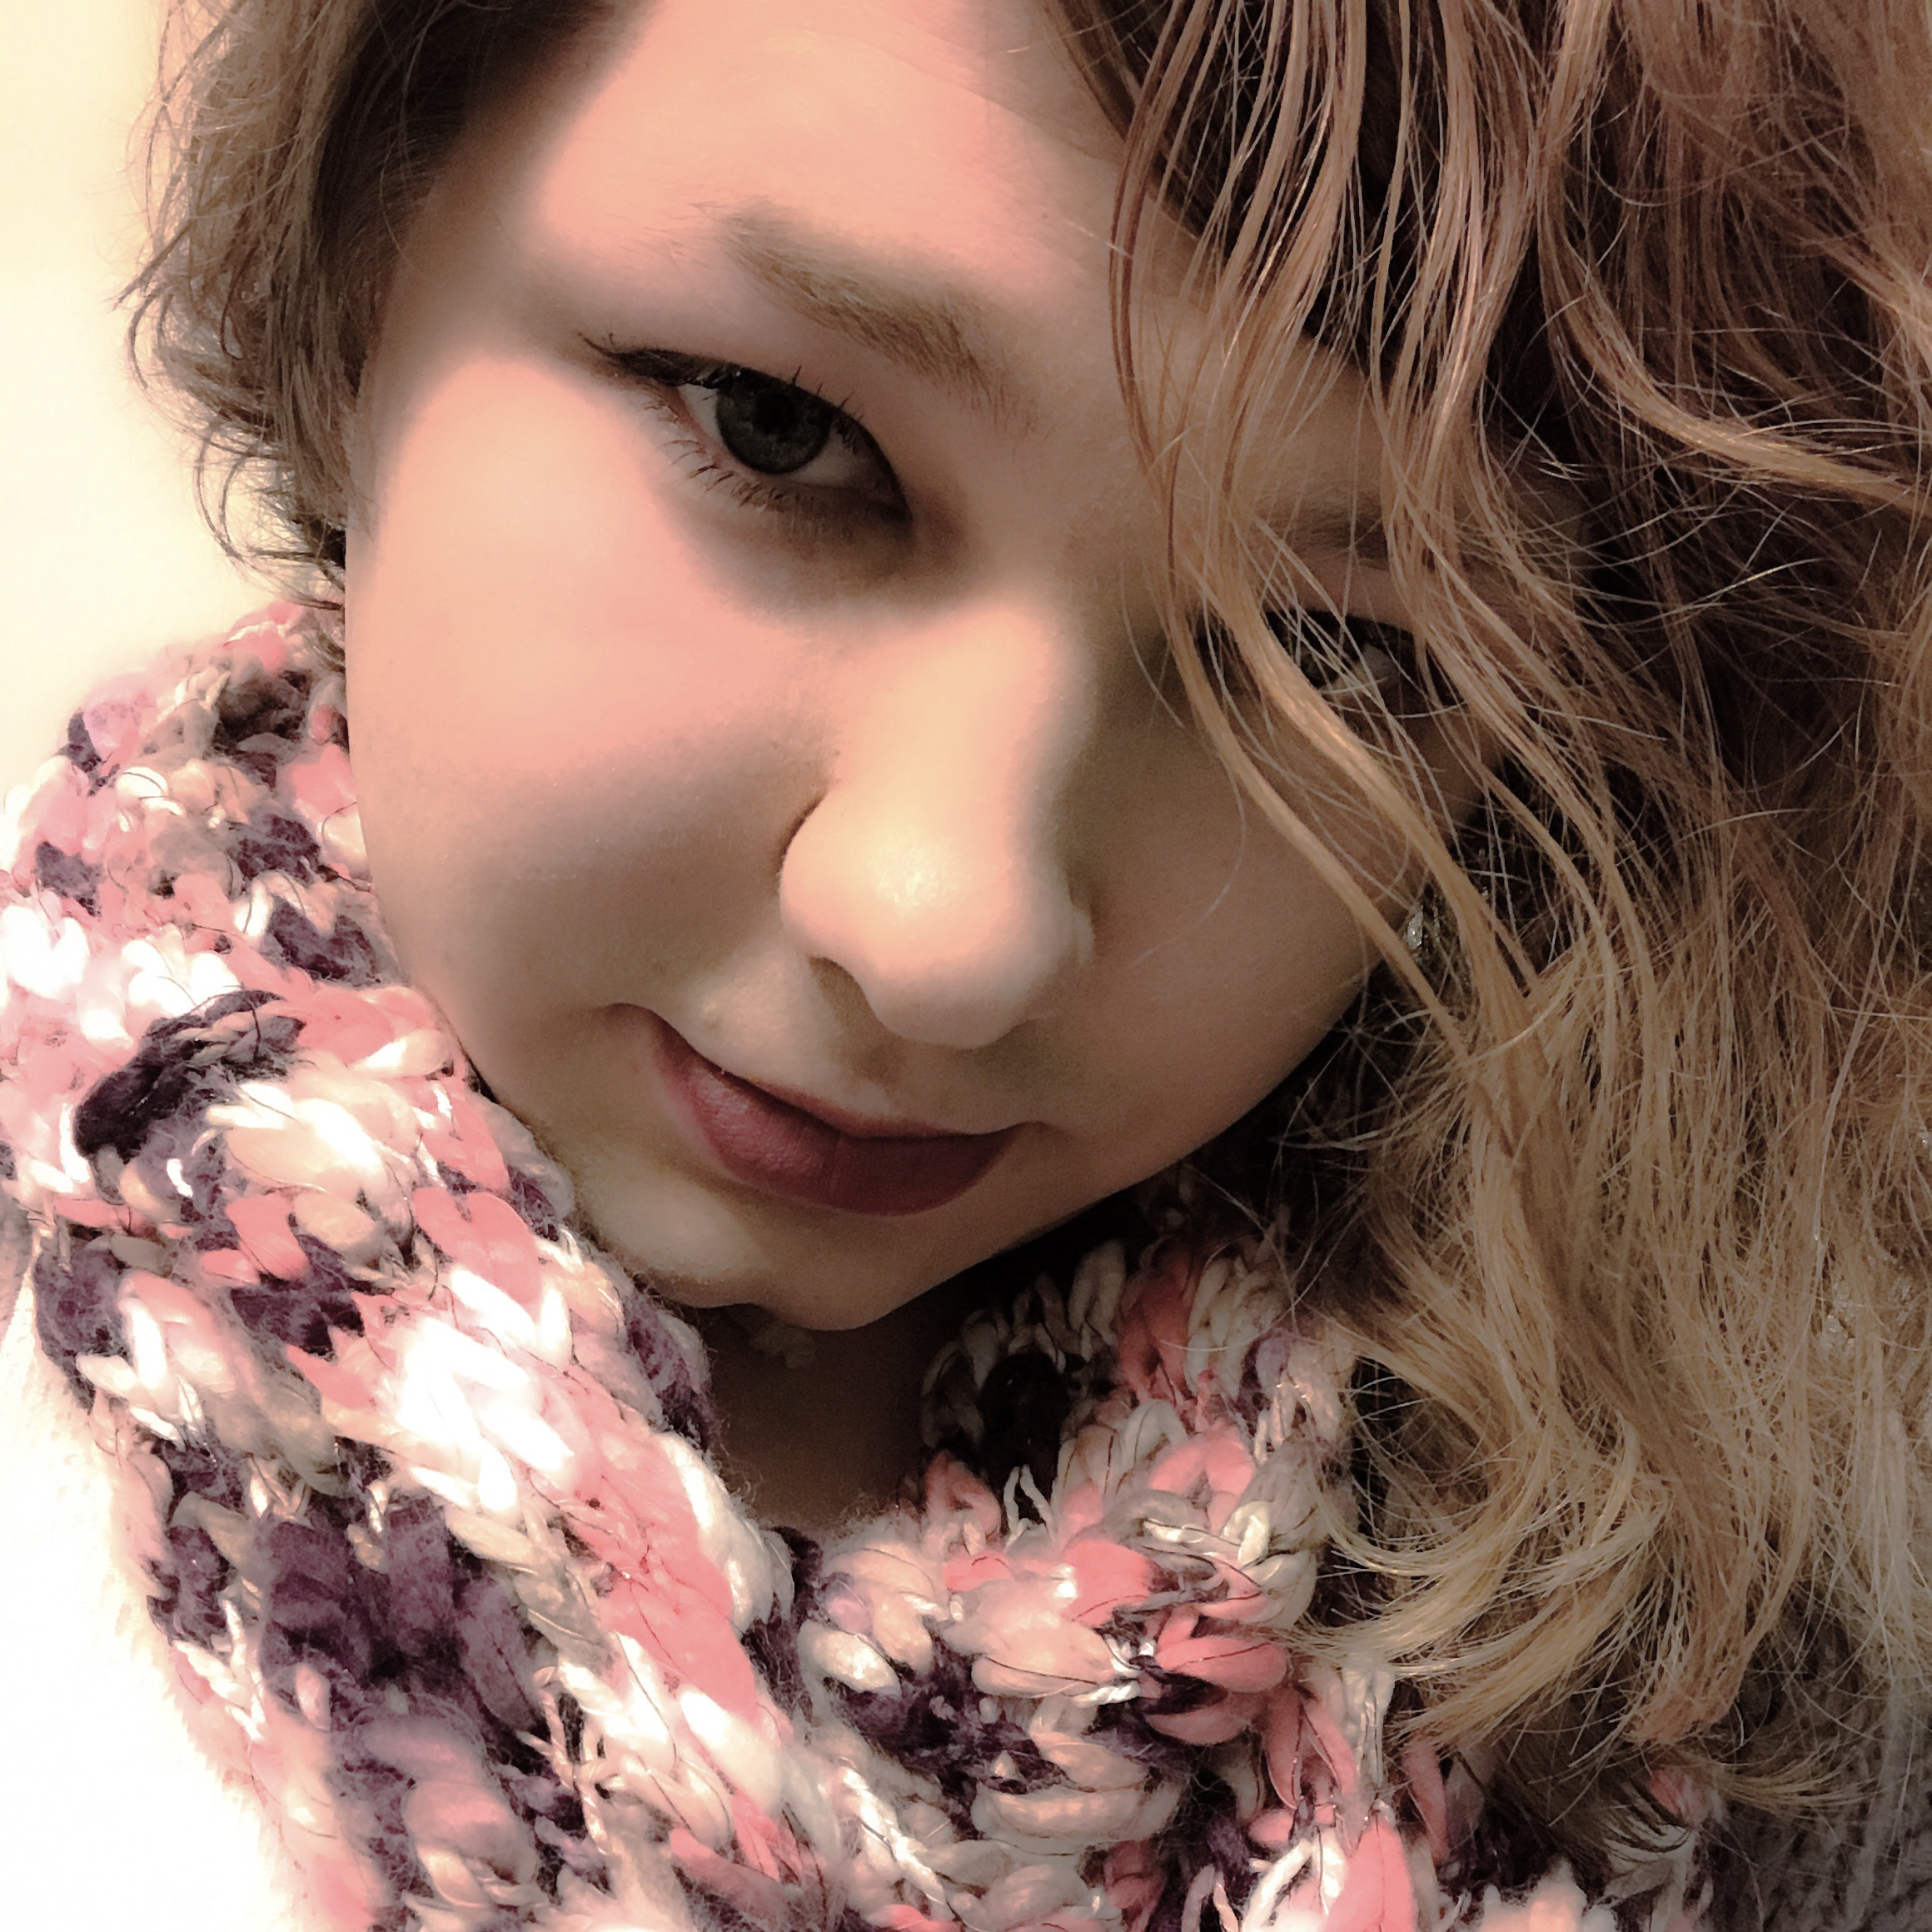 friend.photo.jpg